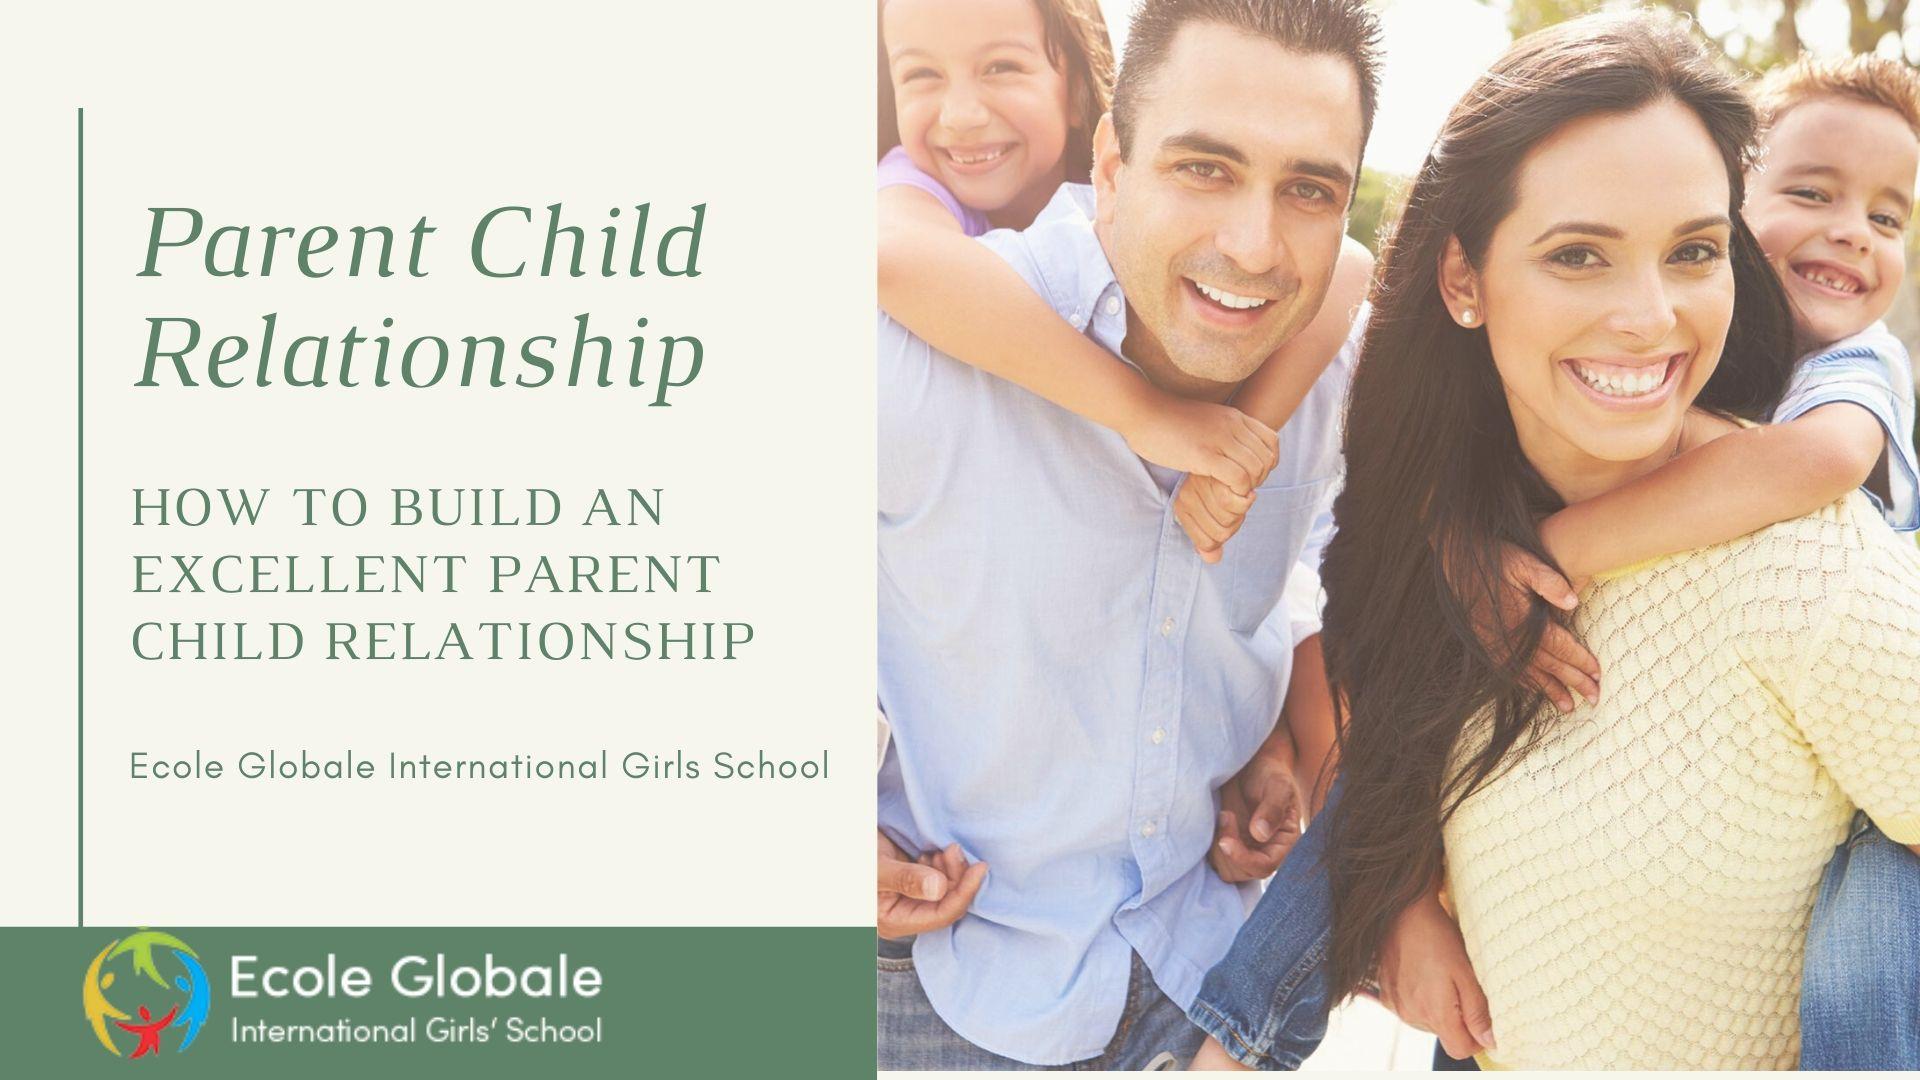 How to Build an Excellent Parent Child Relationship